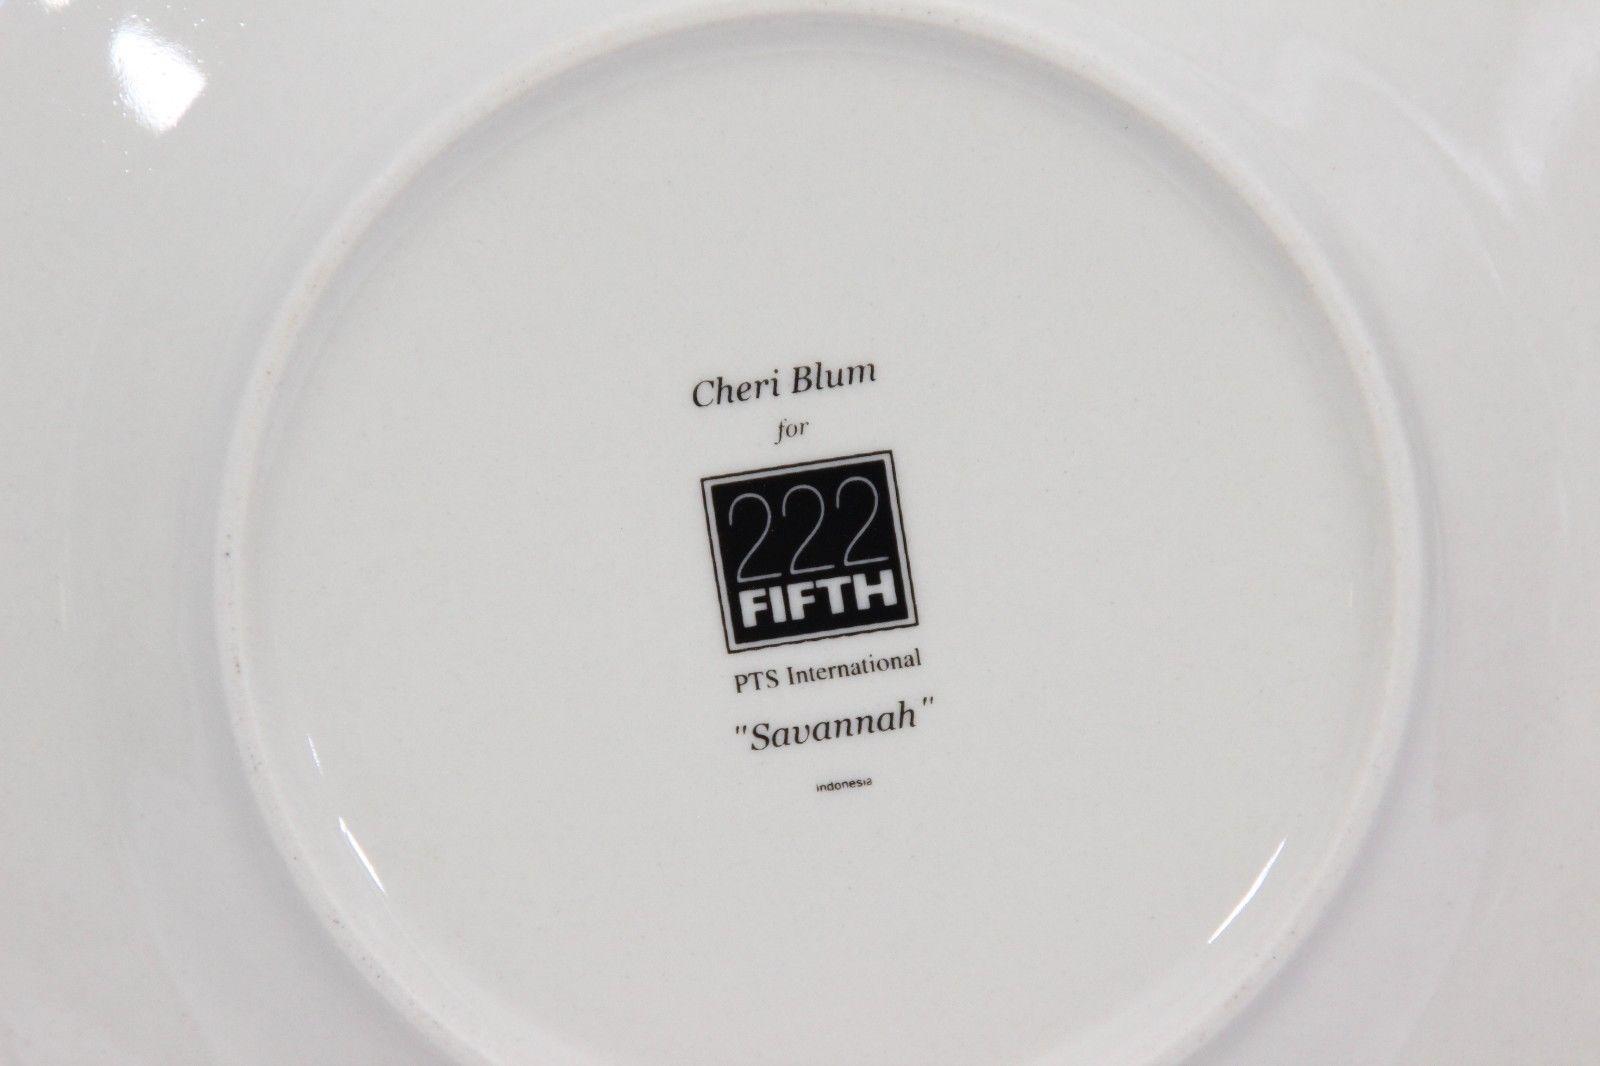 "222 Fifth Savannah Plates Saucers 6.5"" Set of 8 image 4"